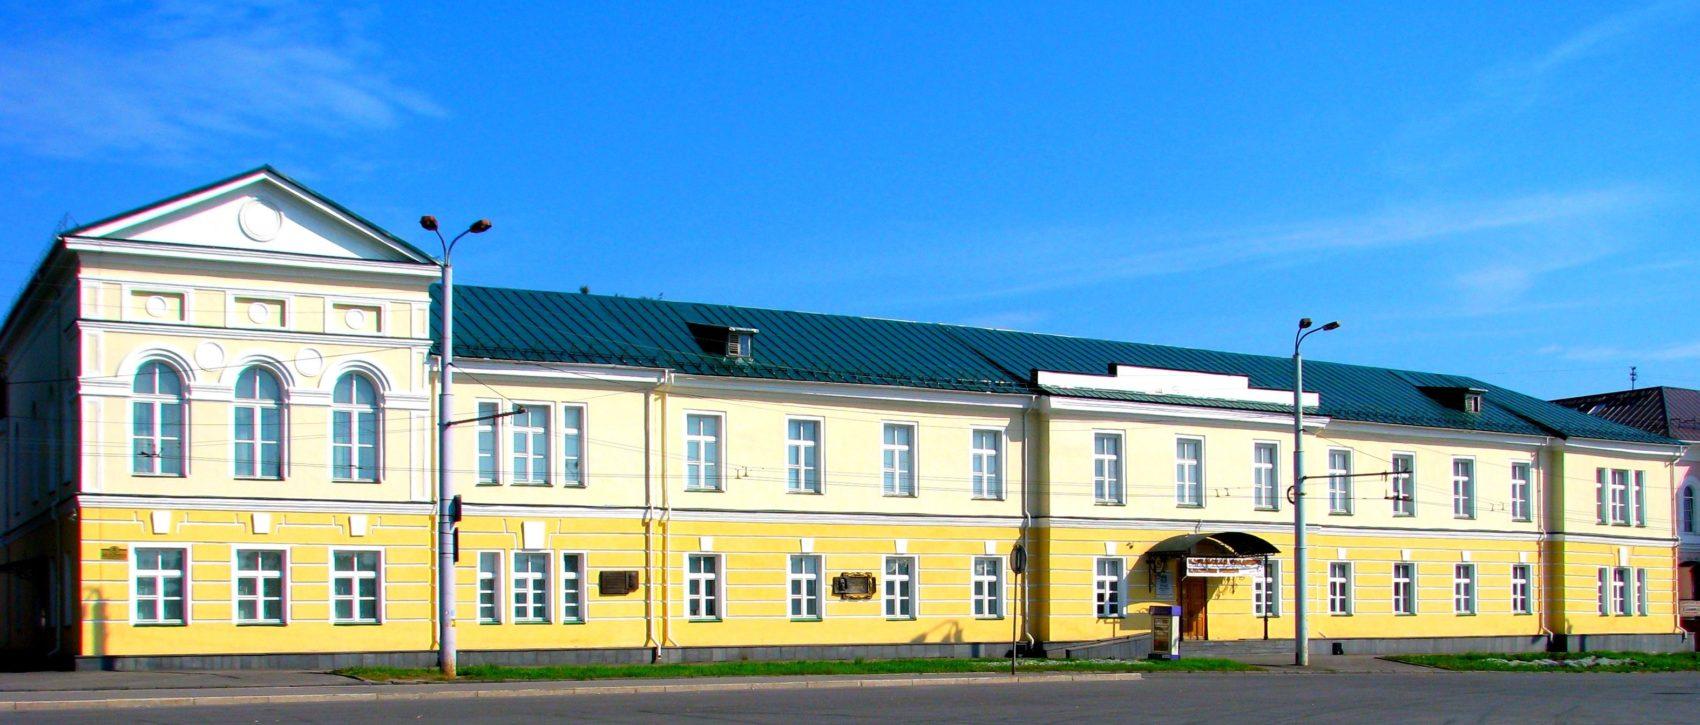 музей изо, здание